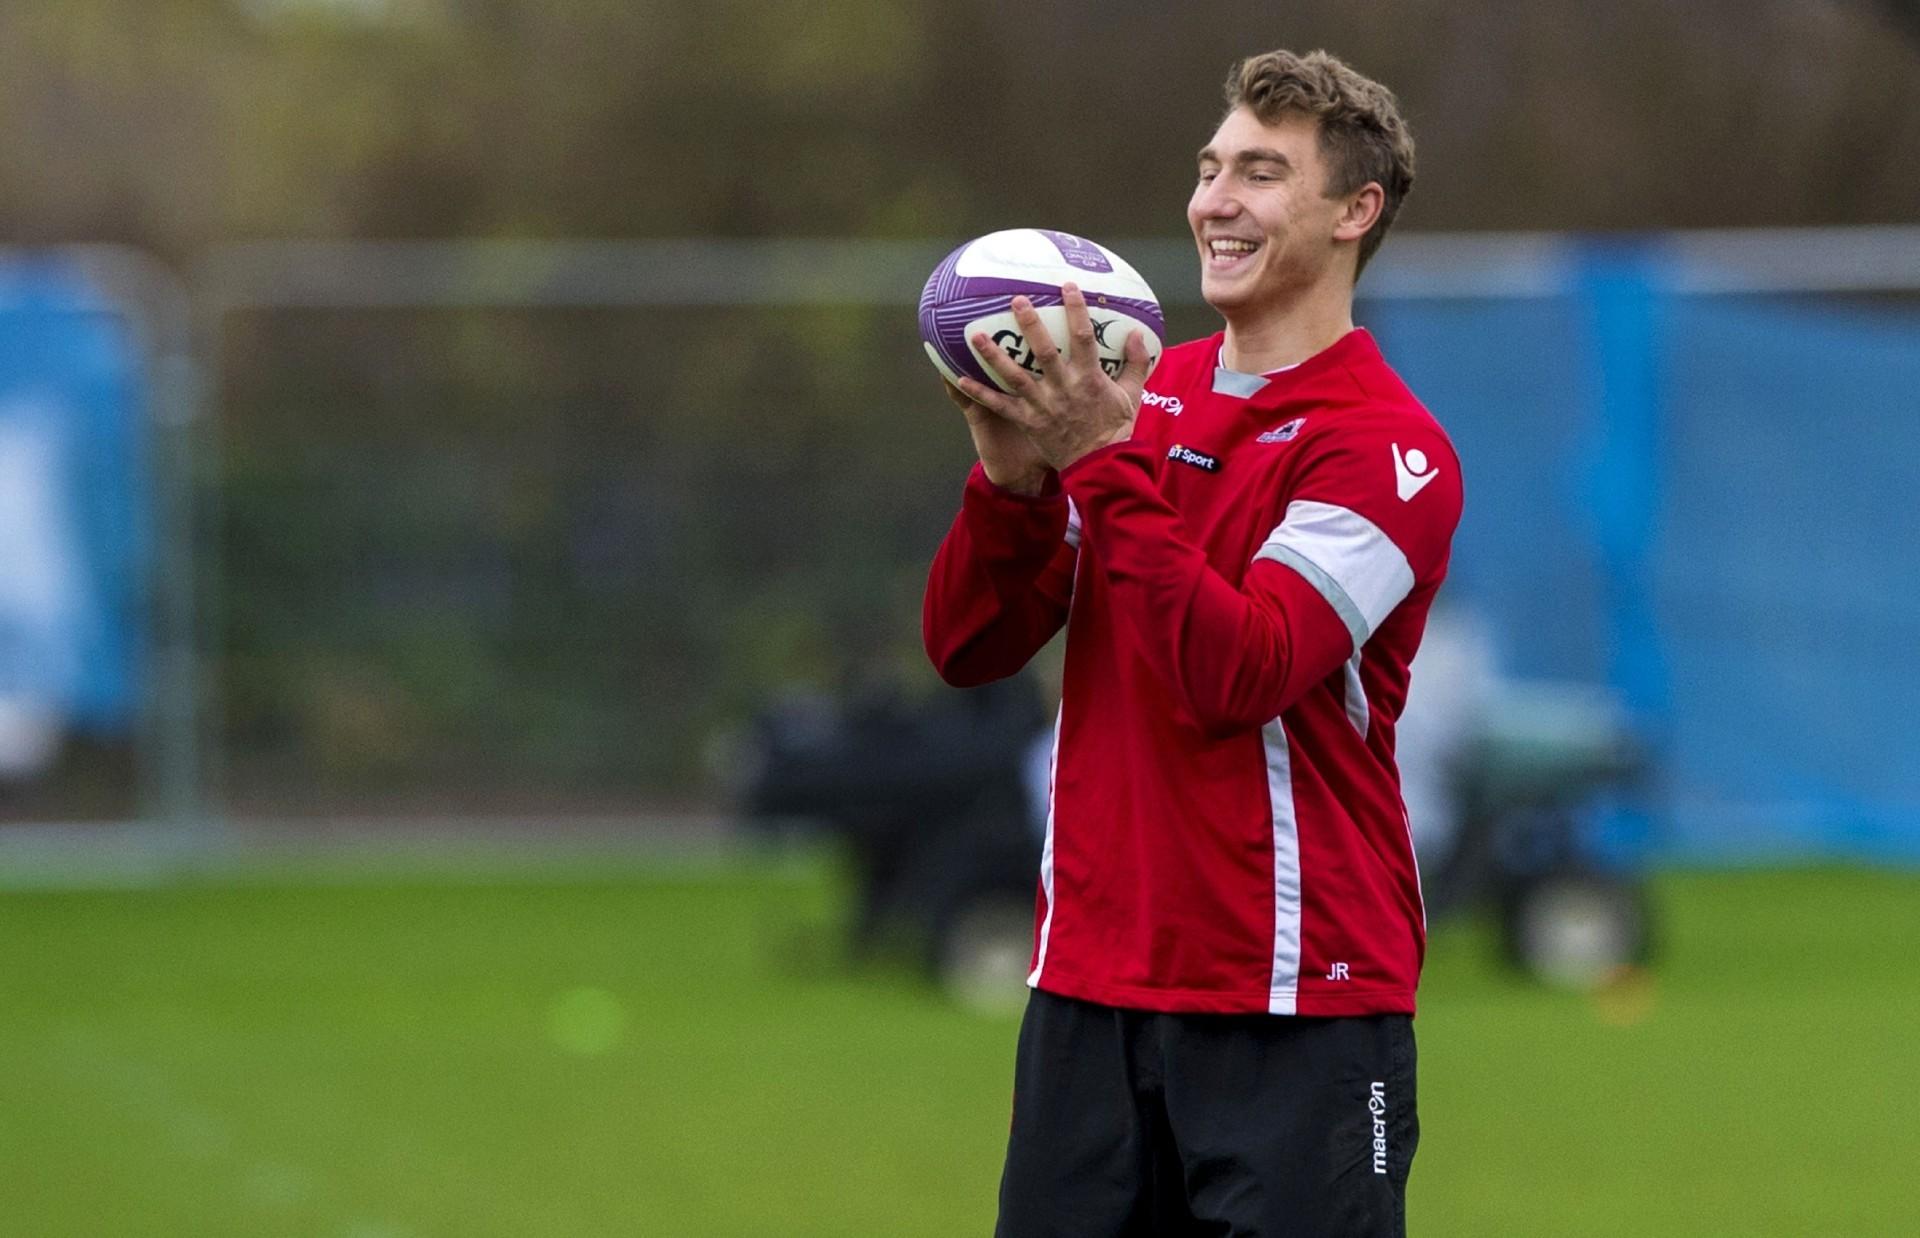 Teenager Jamie Ritchie is one Scottish player who has broken through at Edinburgh this season. Pic: SNS/SRU